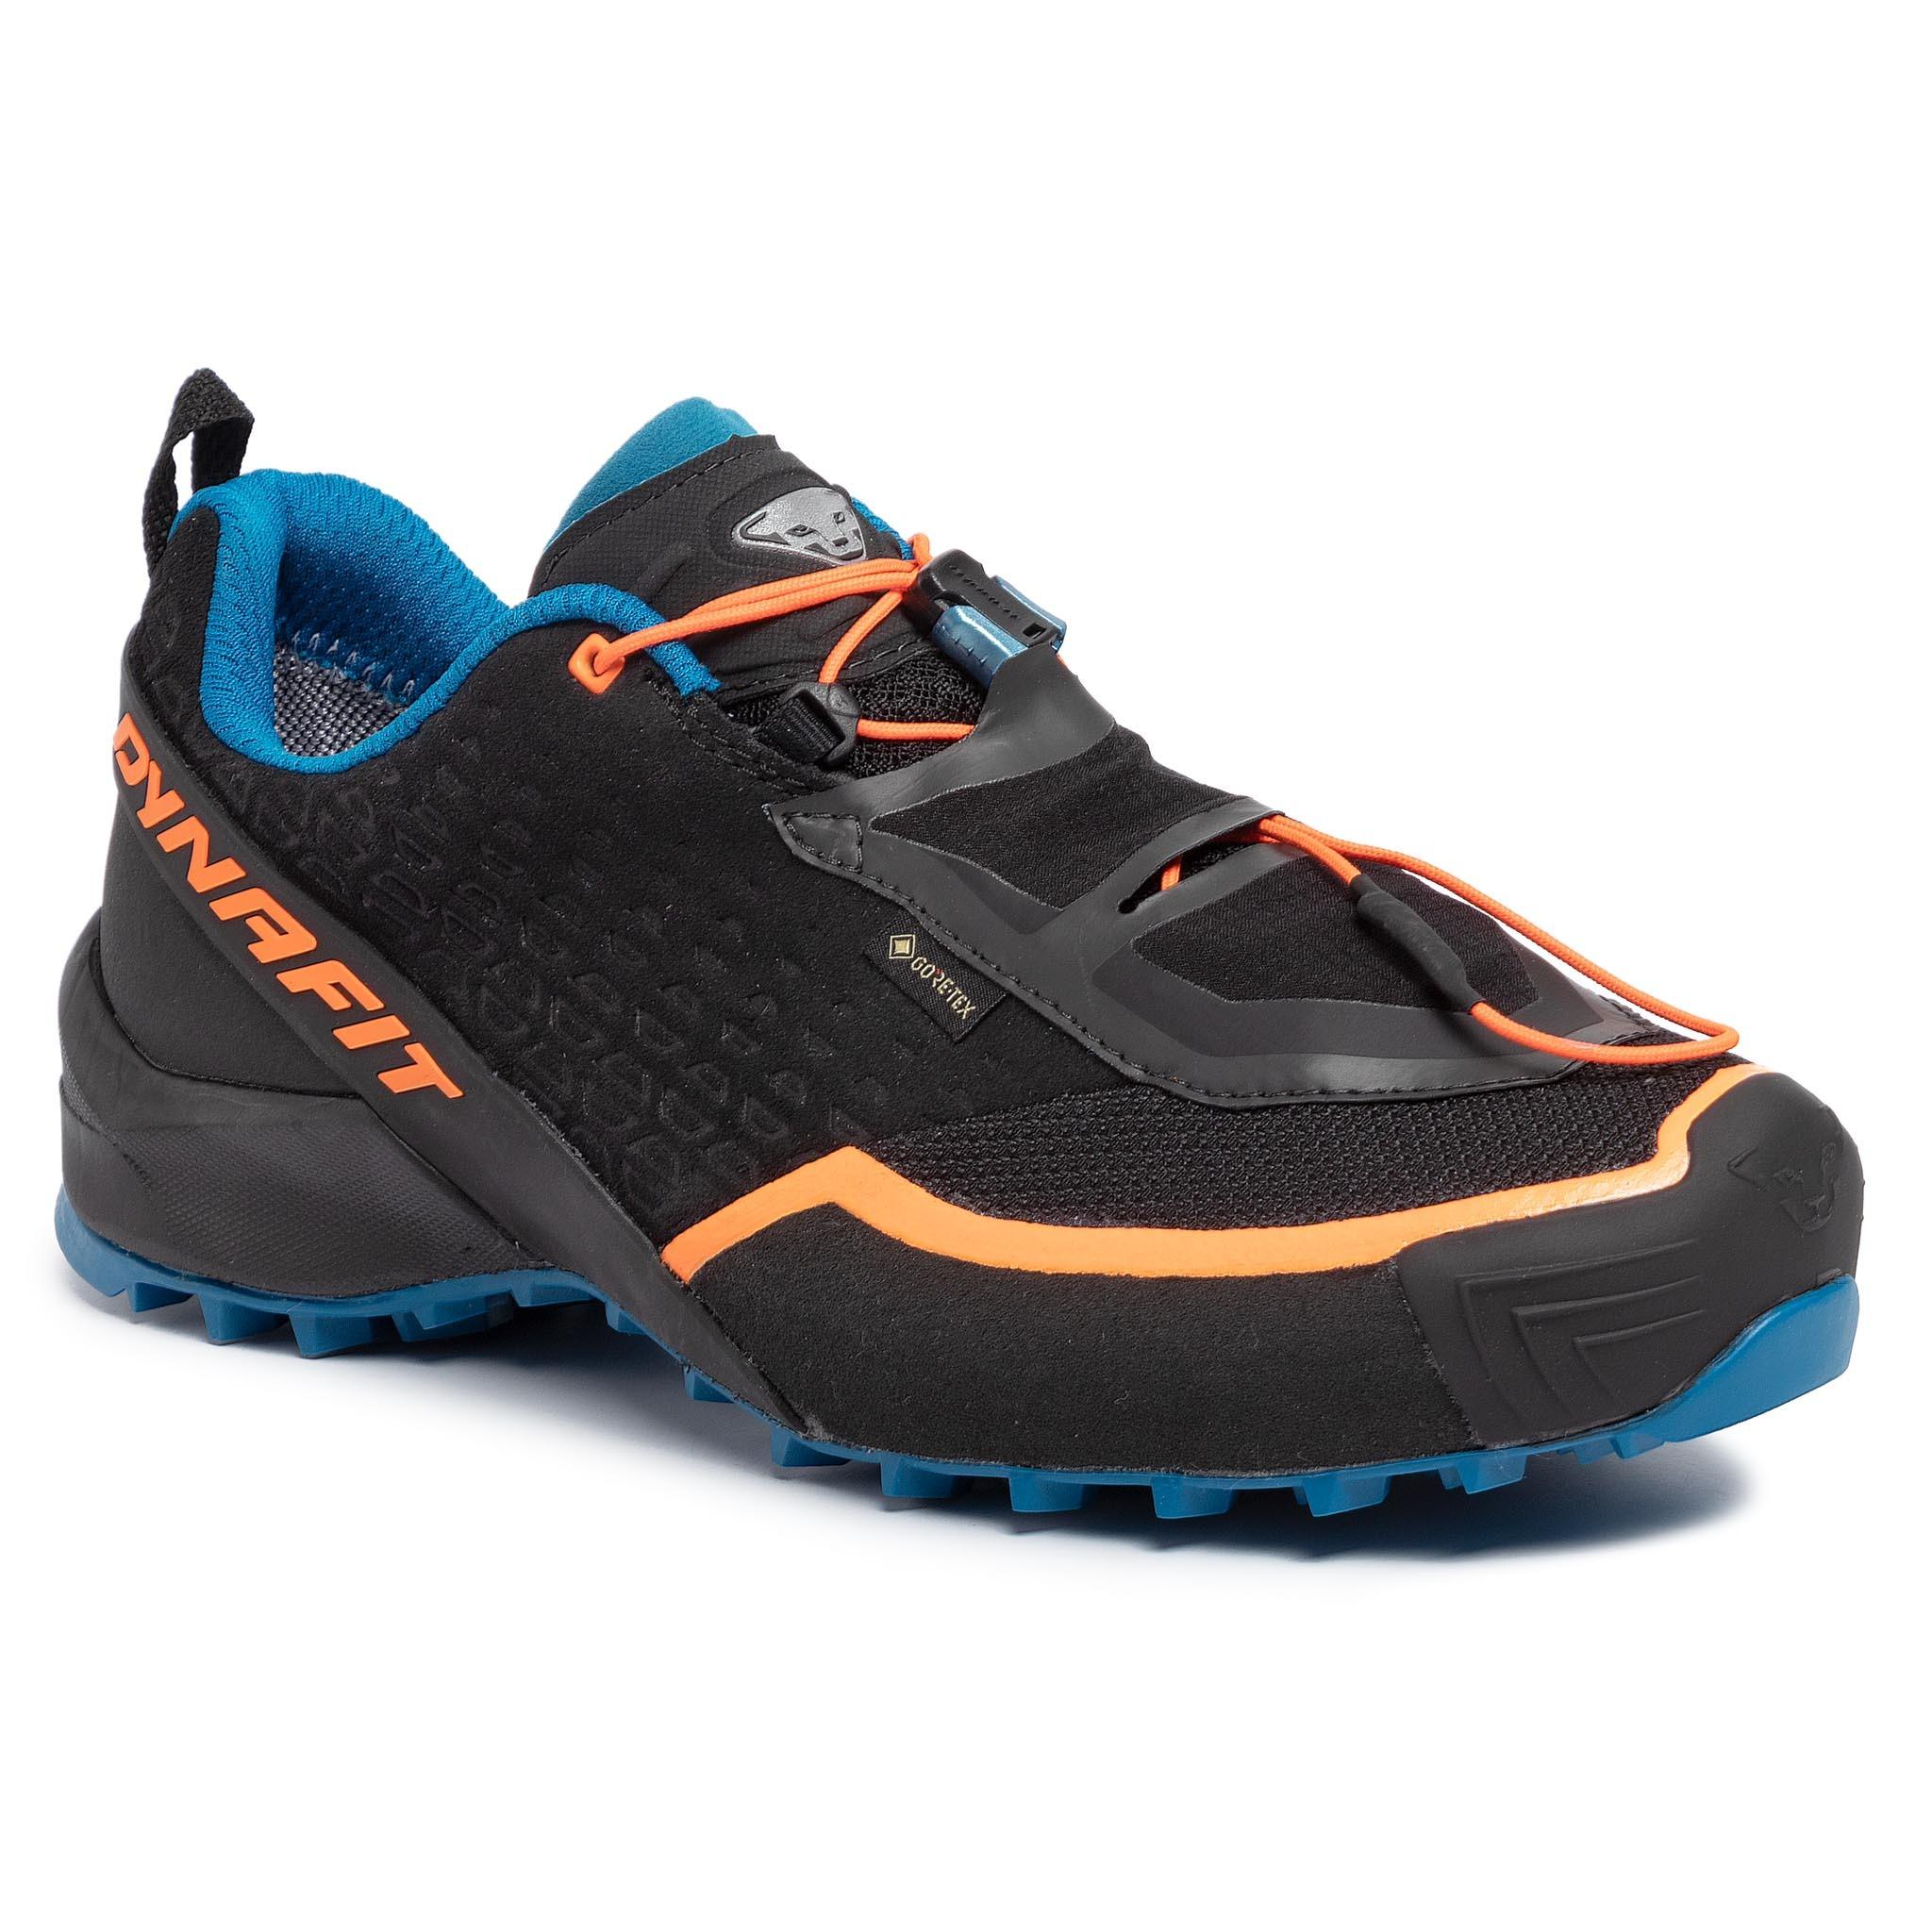 Pantofi DYNAFIT - Speed Mtn Gtx GORE-TEX 64036 Black/Mykonos Blue 0987